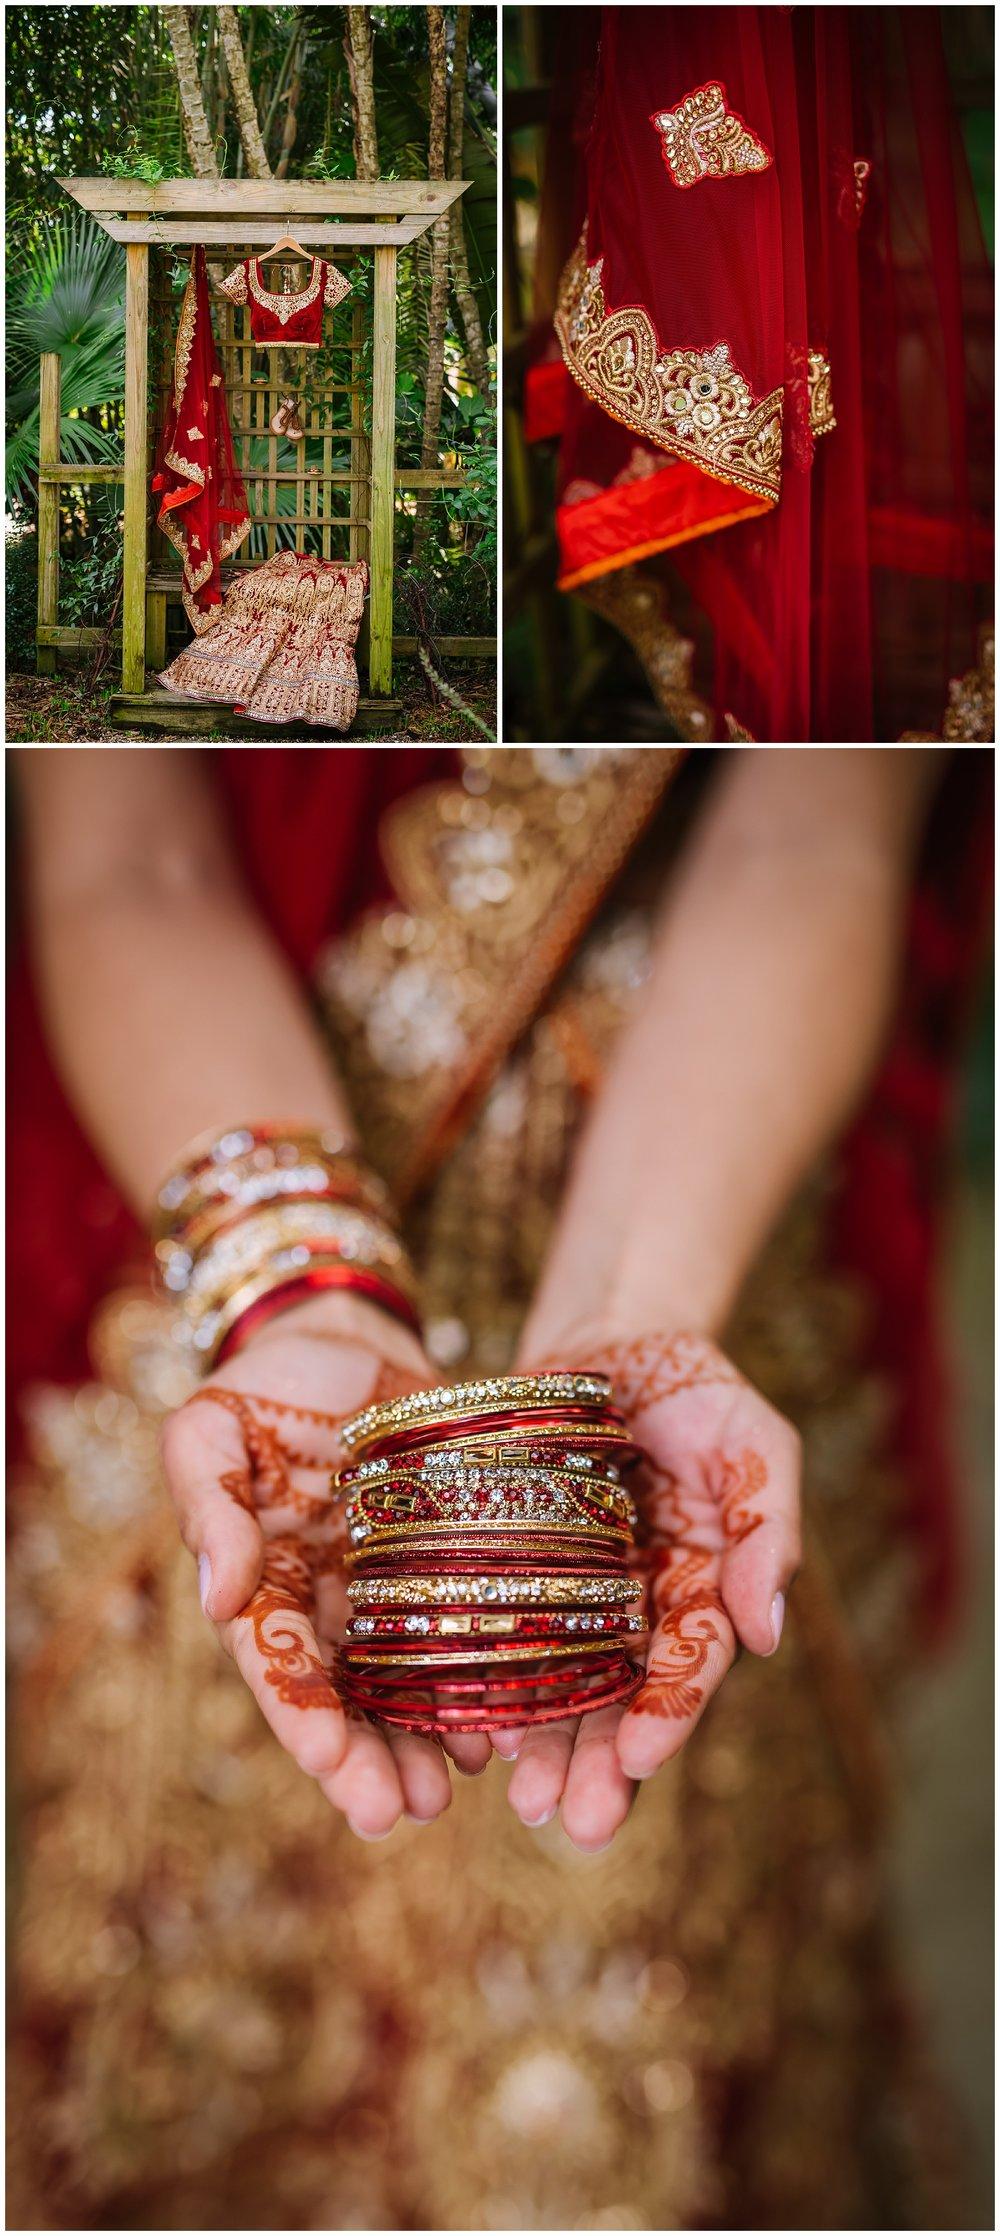 Ashlee-hamon-photography-year-in-review-2016-travel-wanderlust-vsco-adventure-wedding_0025.jpg